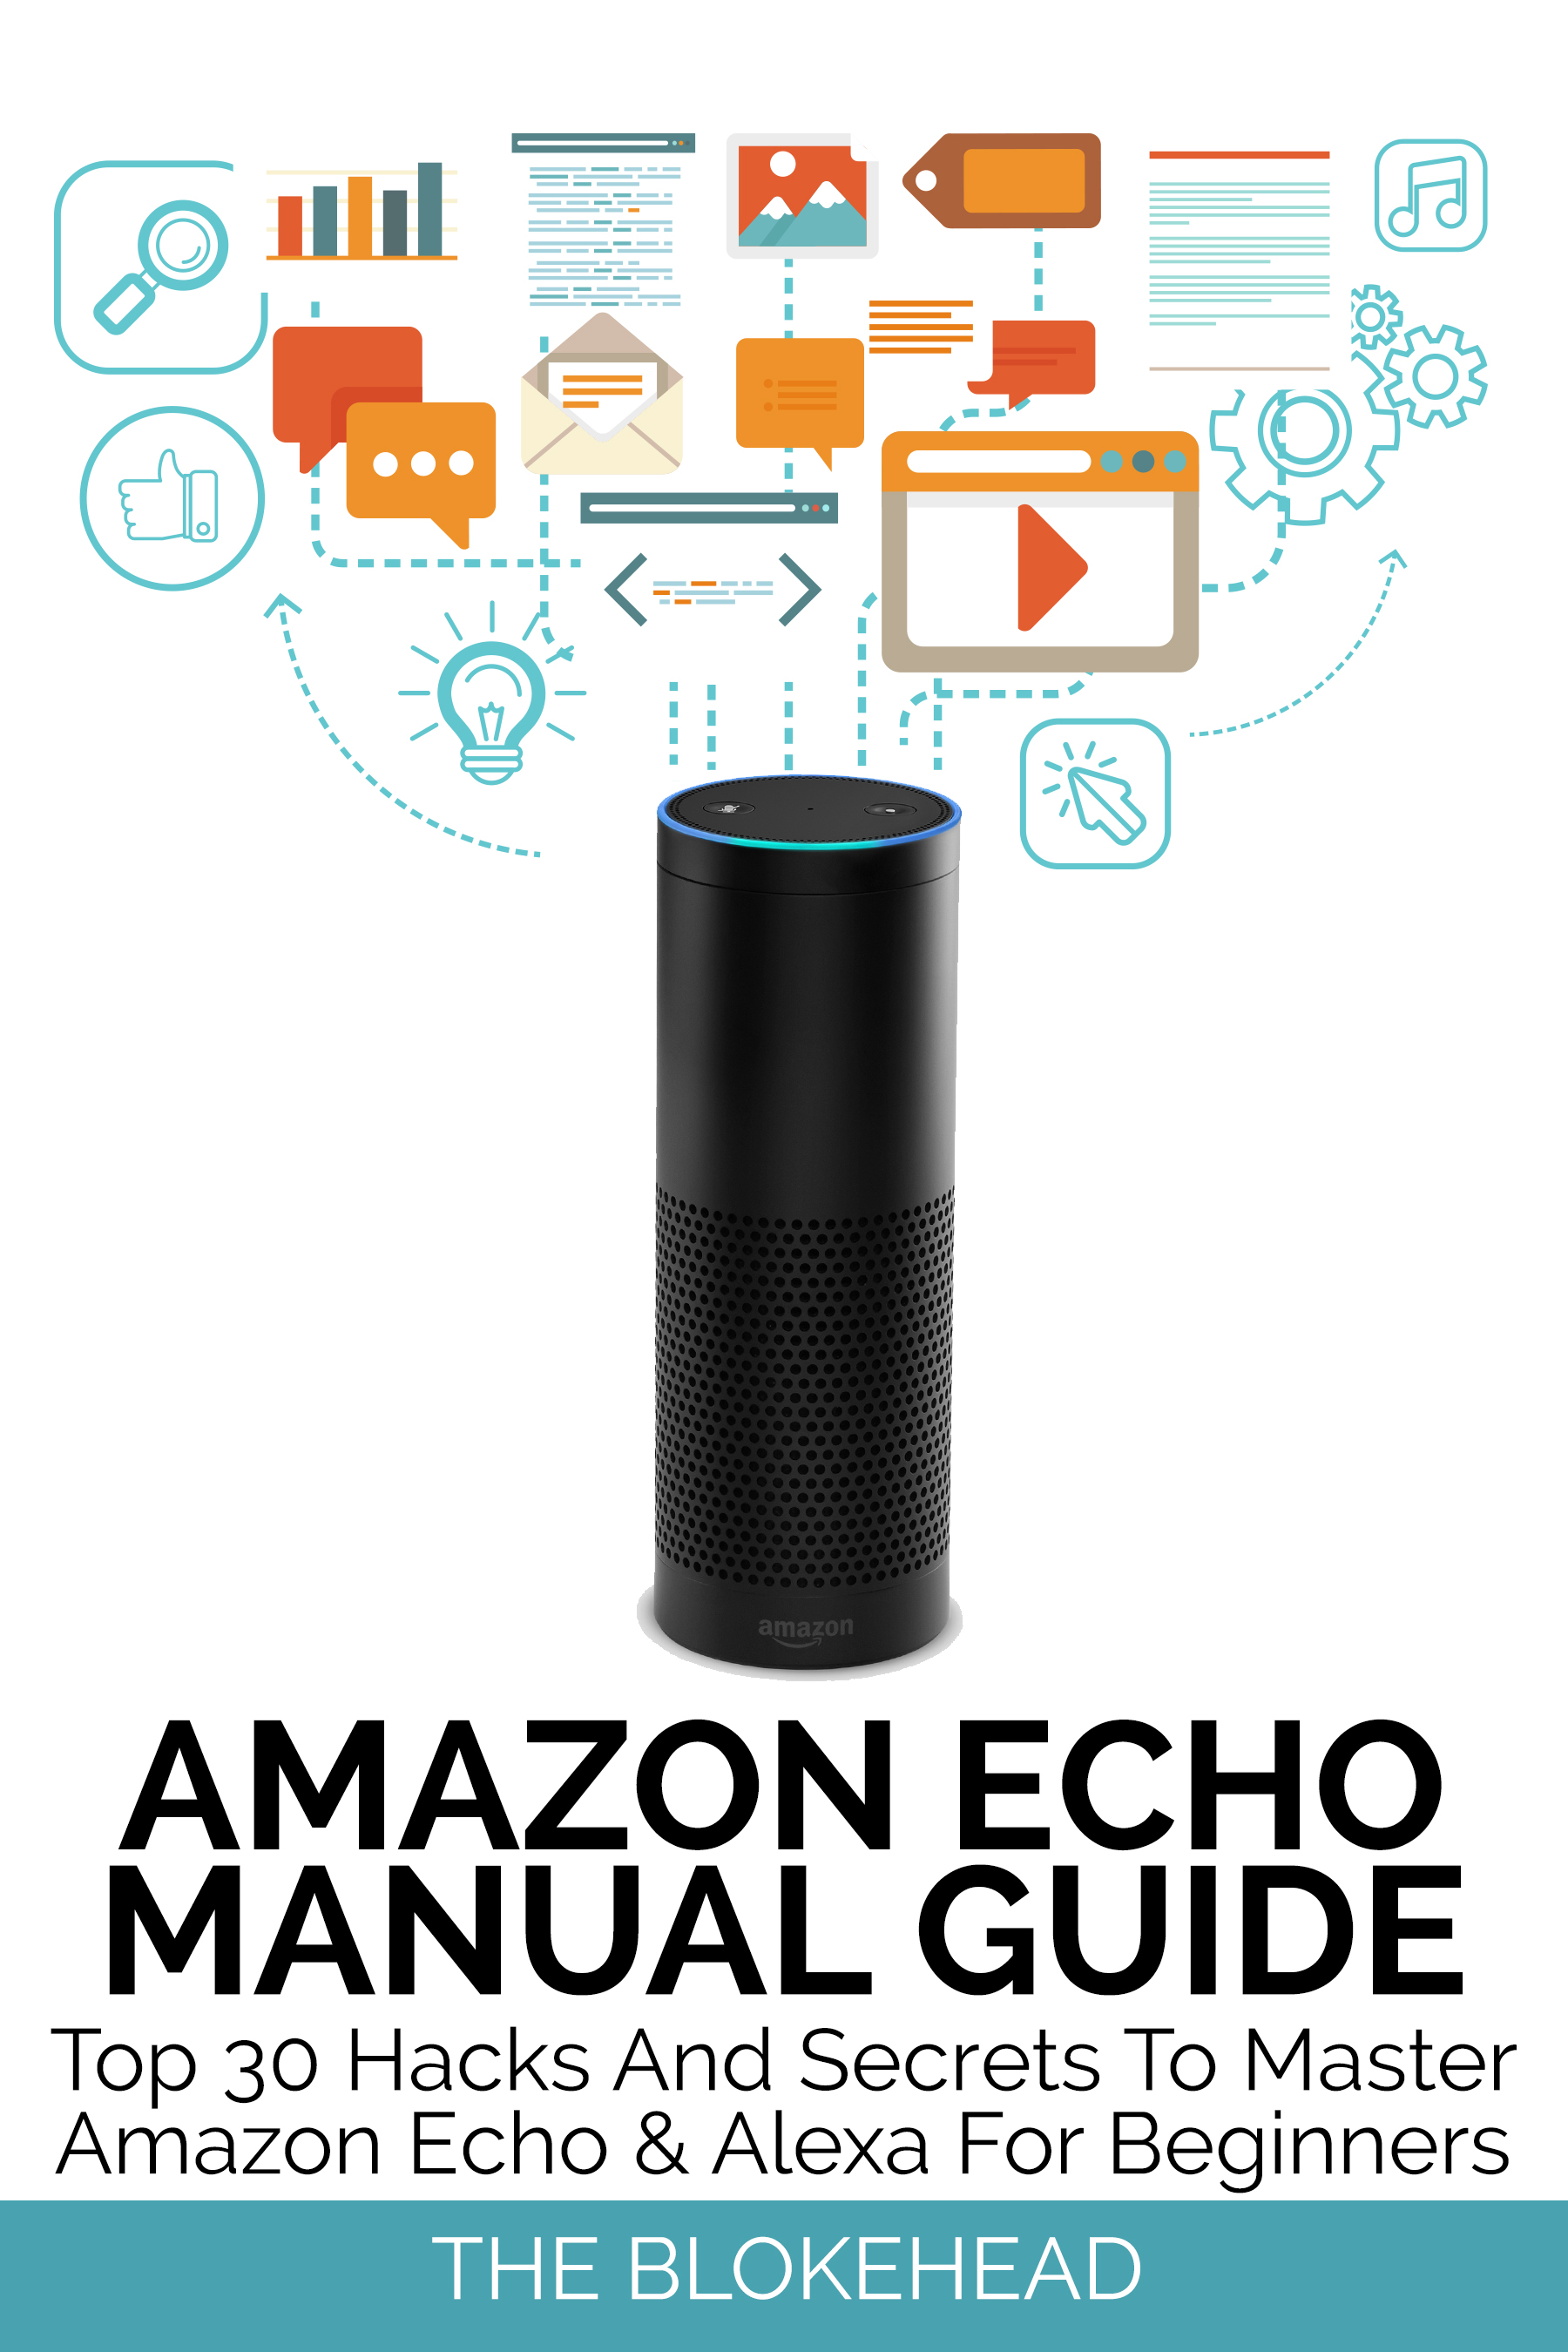 Amazon echo manual guide : top 30 hacks and secrets to master amazon echo & alexa for beginners